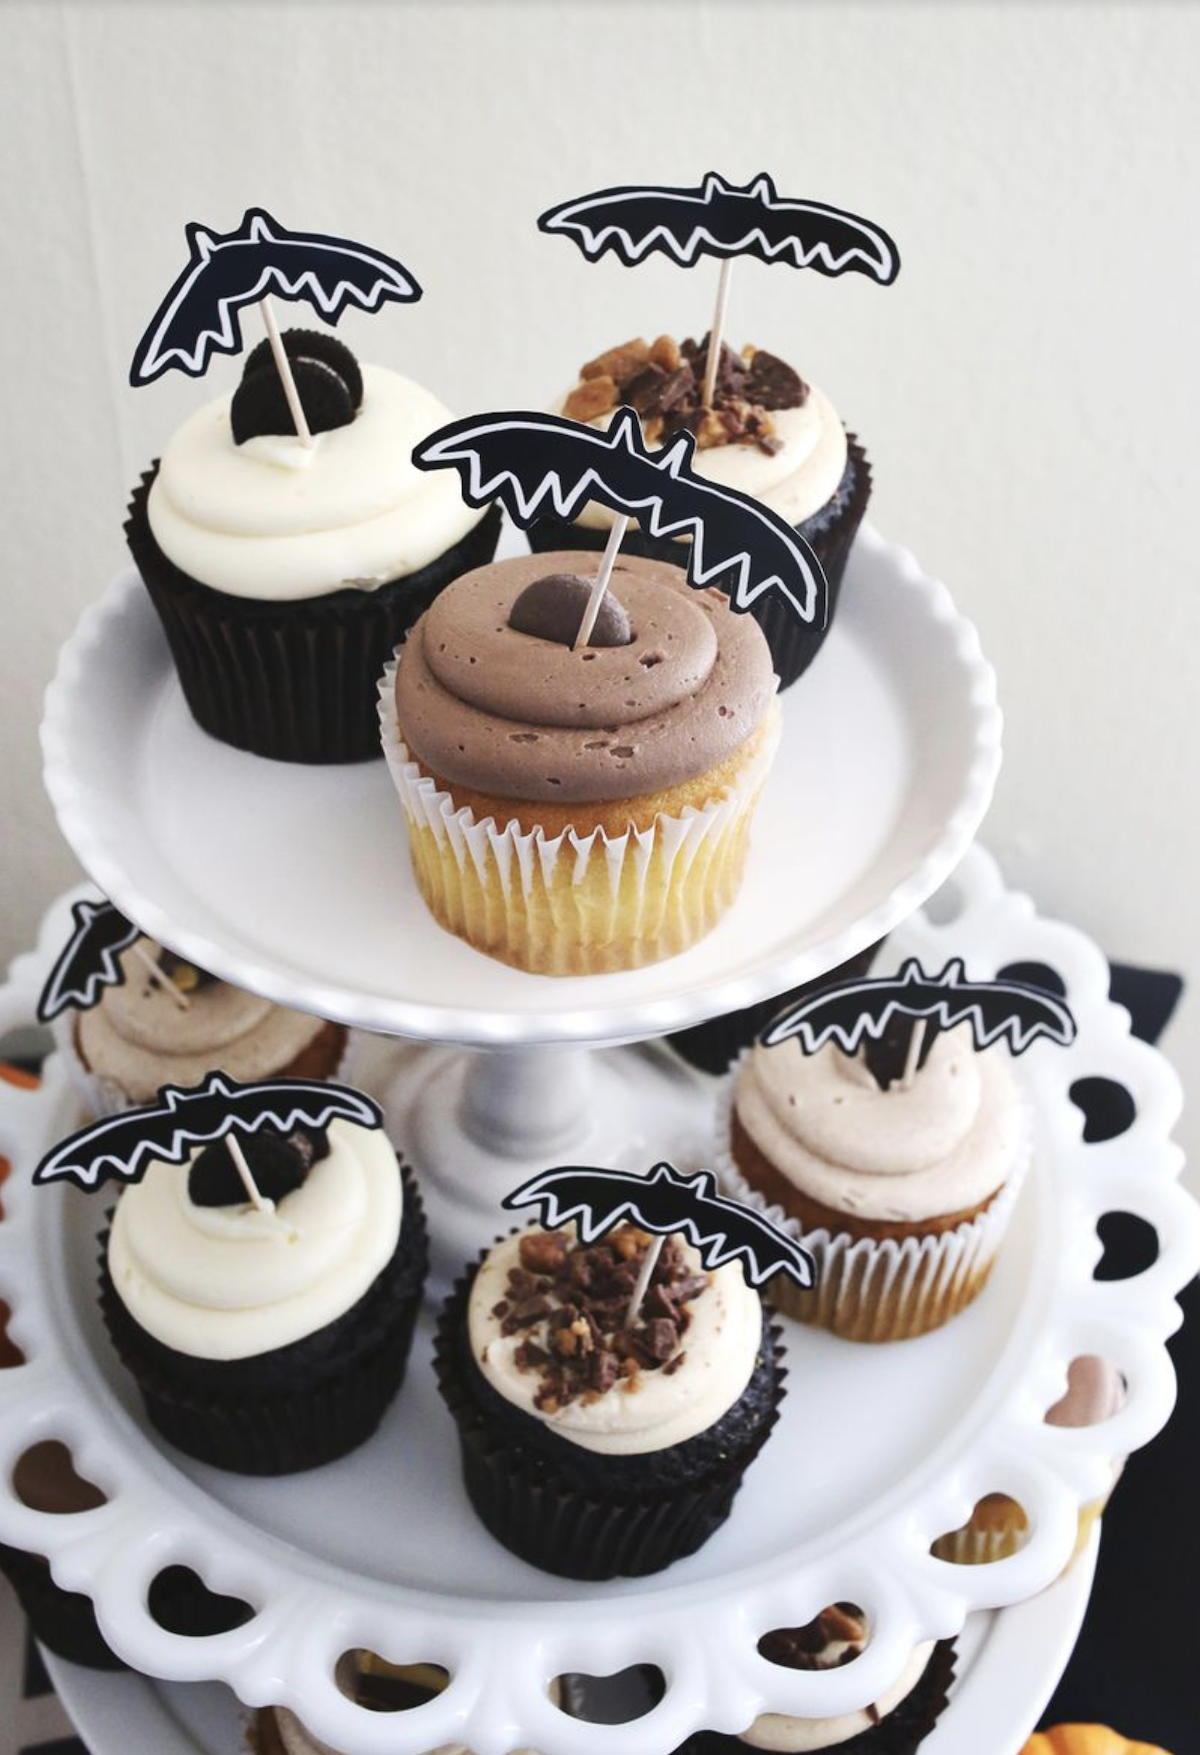 déco diy halloween facile pic cupcake - blog déco - clem around the corner